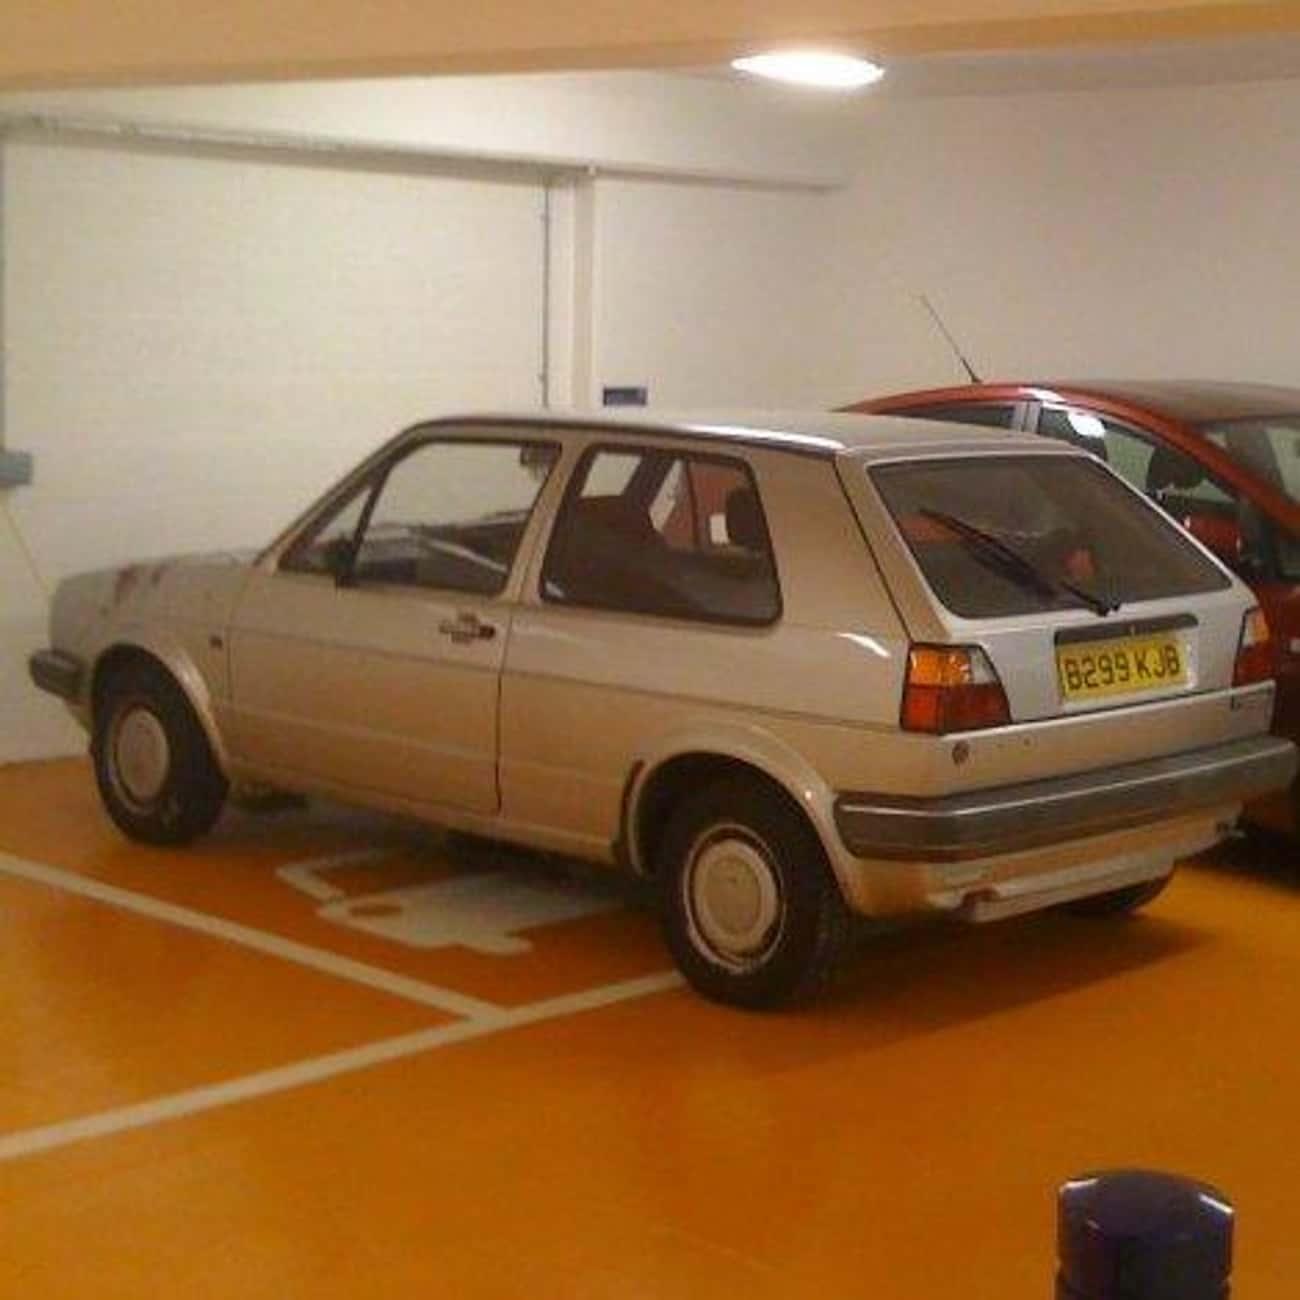 1985 Volkswagen Golf is listed (or ranked) 1 on the list List of Popular Volkswagen Passenger Cars Hatchbacks